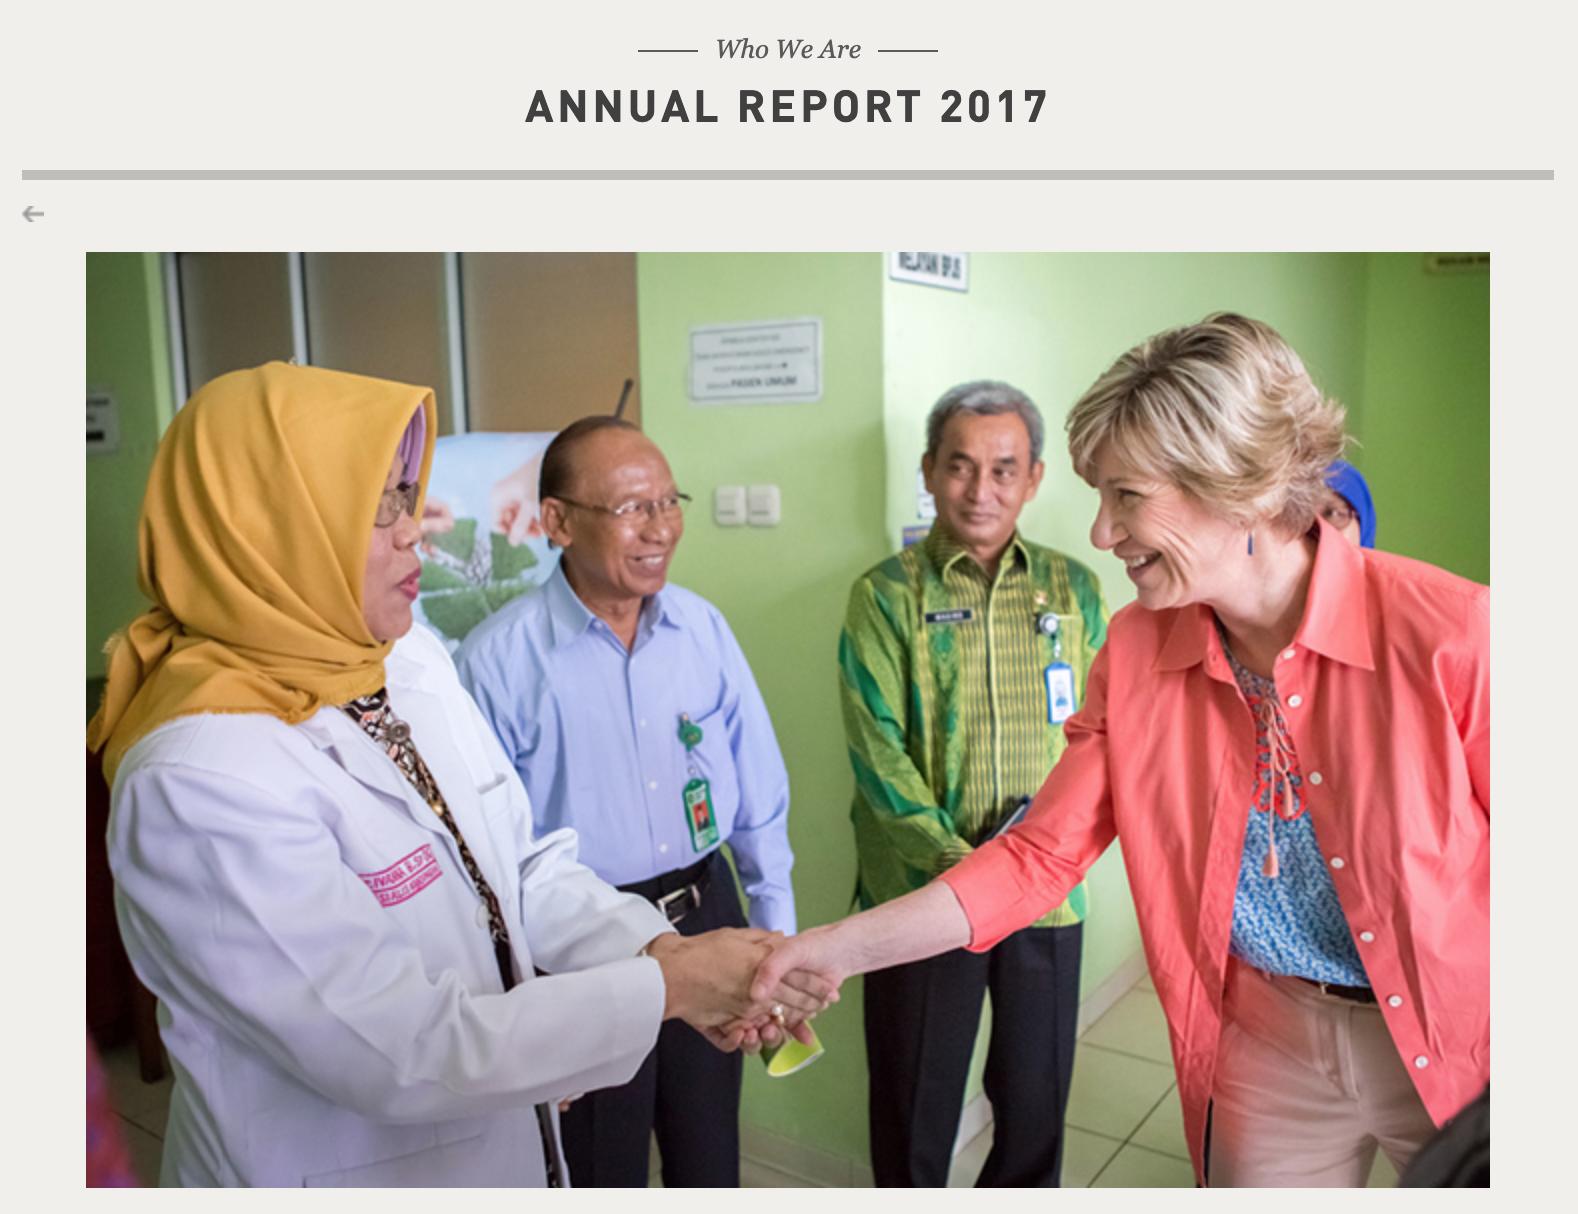 Bill & Melinda Gates Foundation 2017 Annual Report